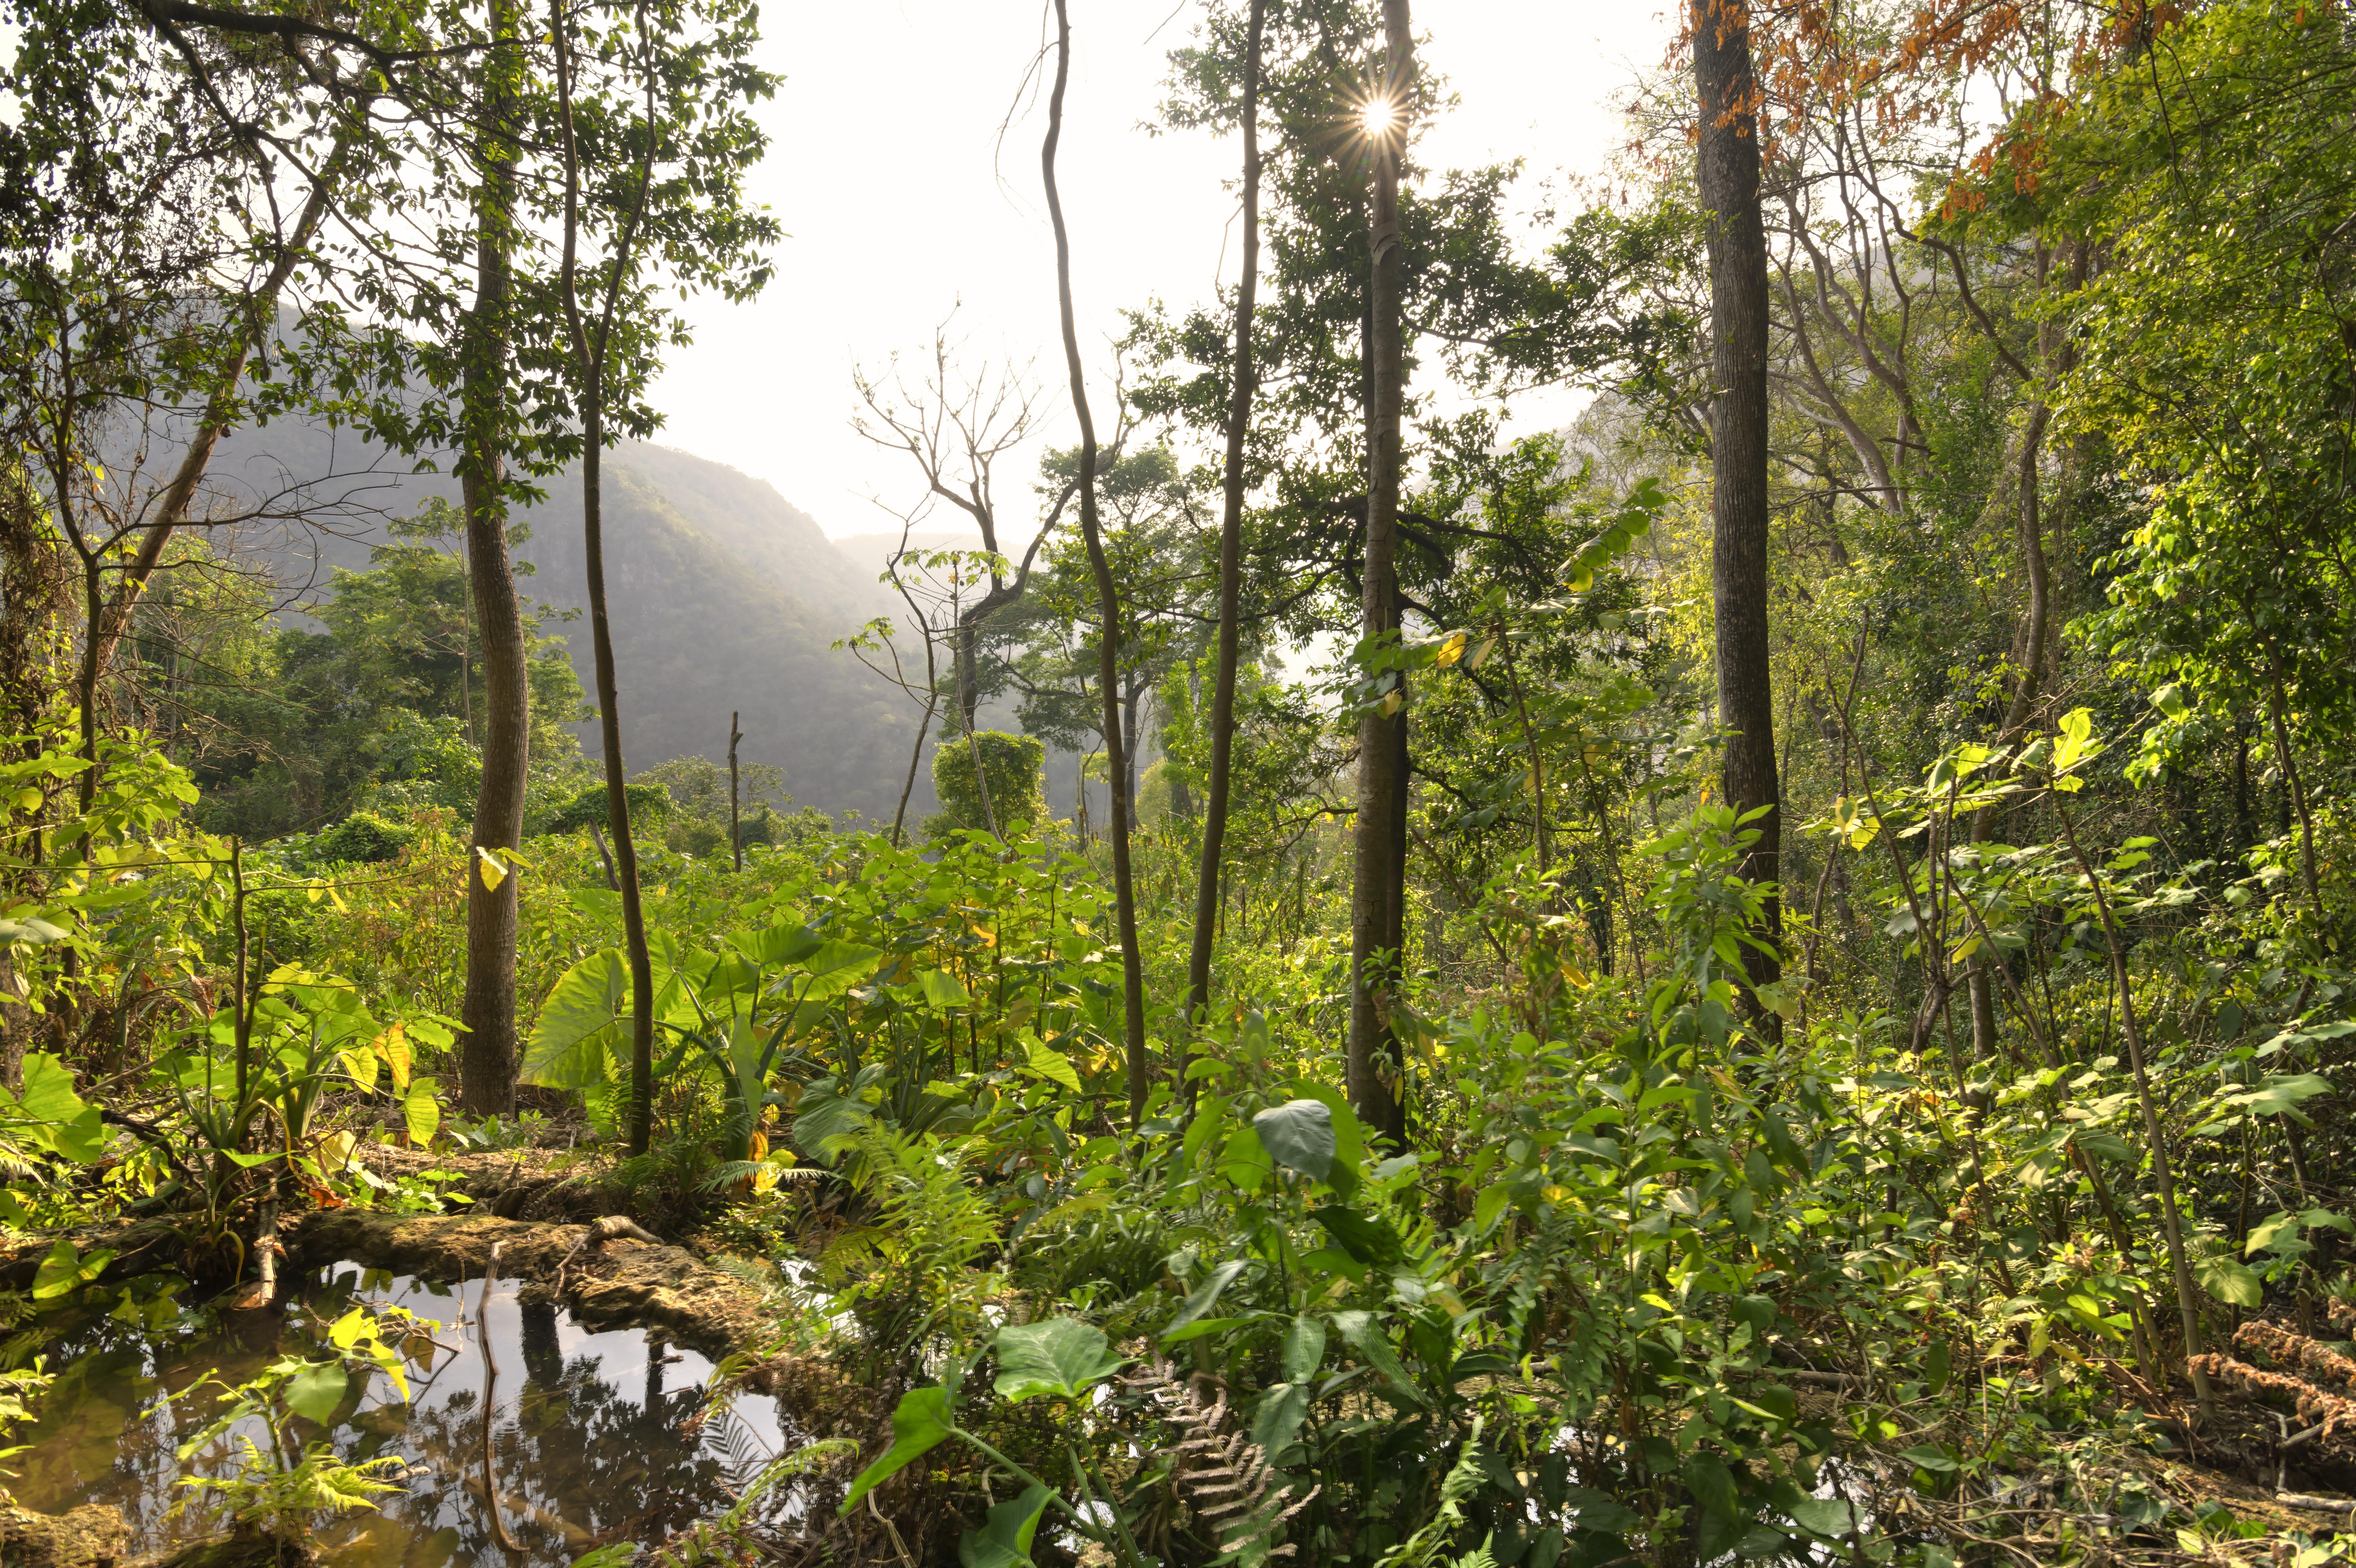 dense jungle vegetation under hazy afternoon sun in Chiapas, Mexico